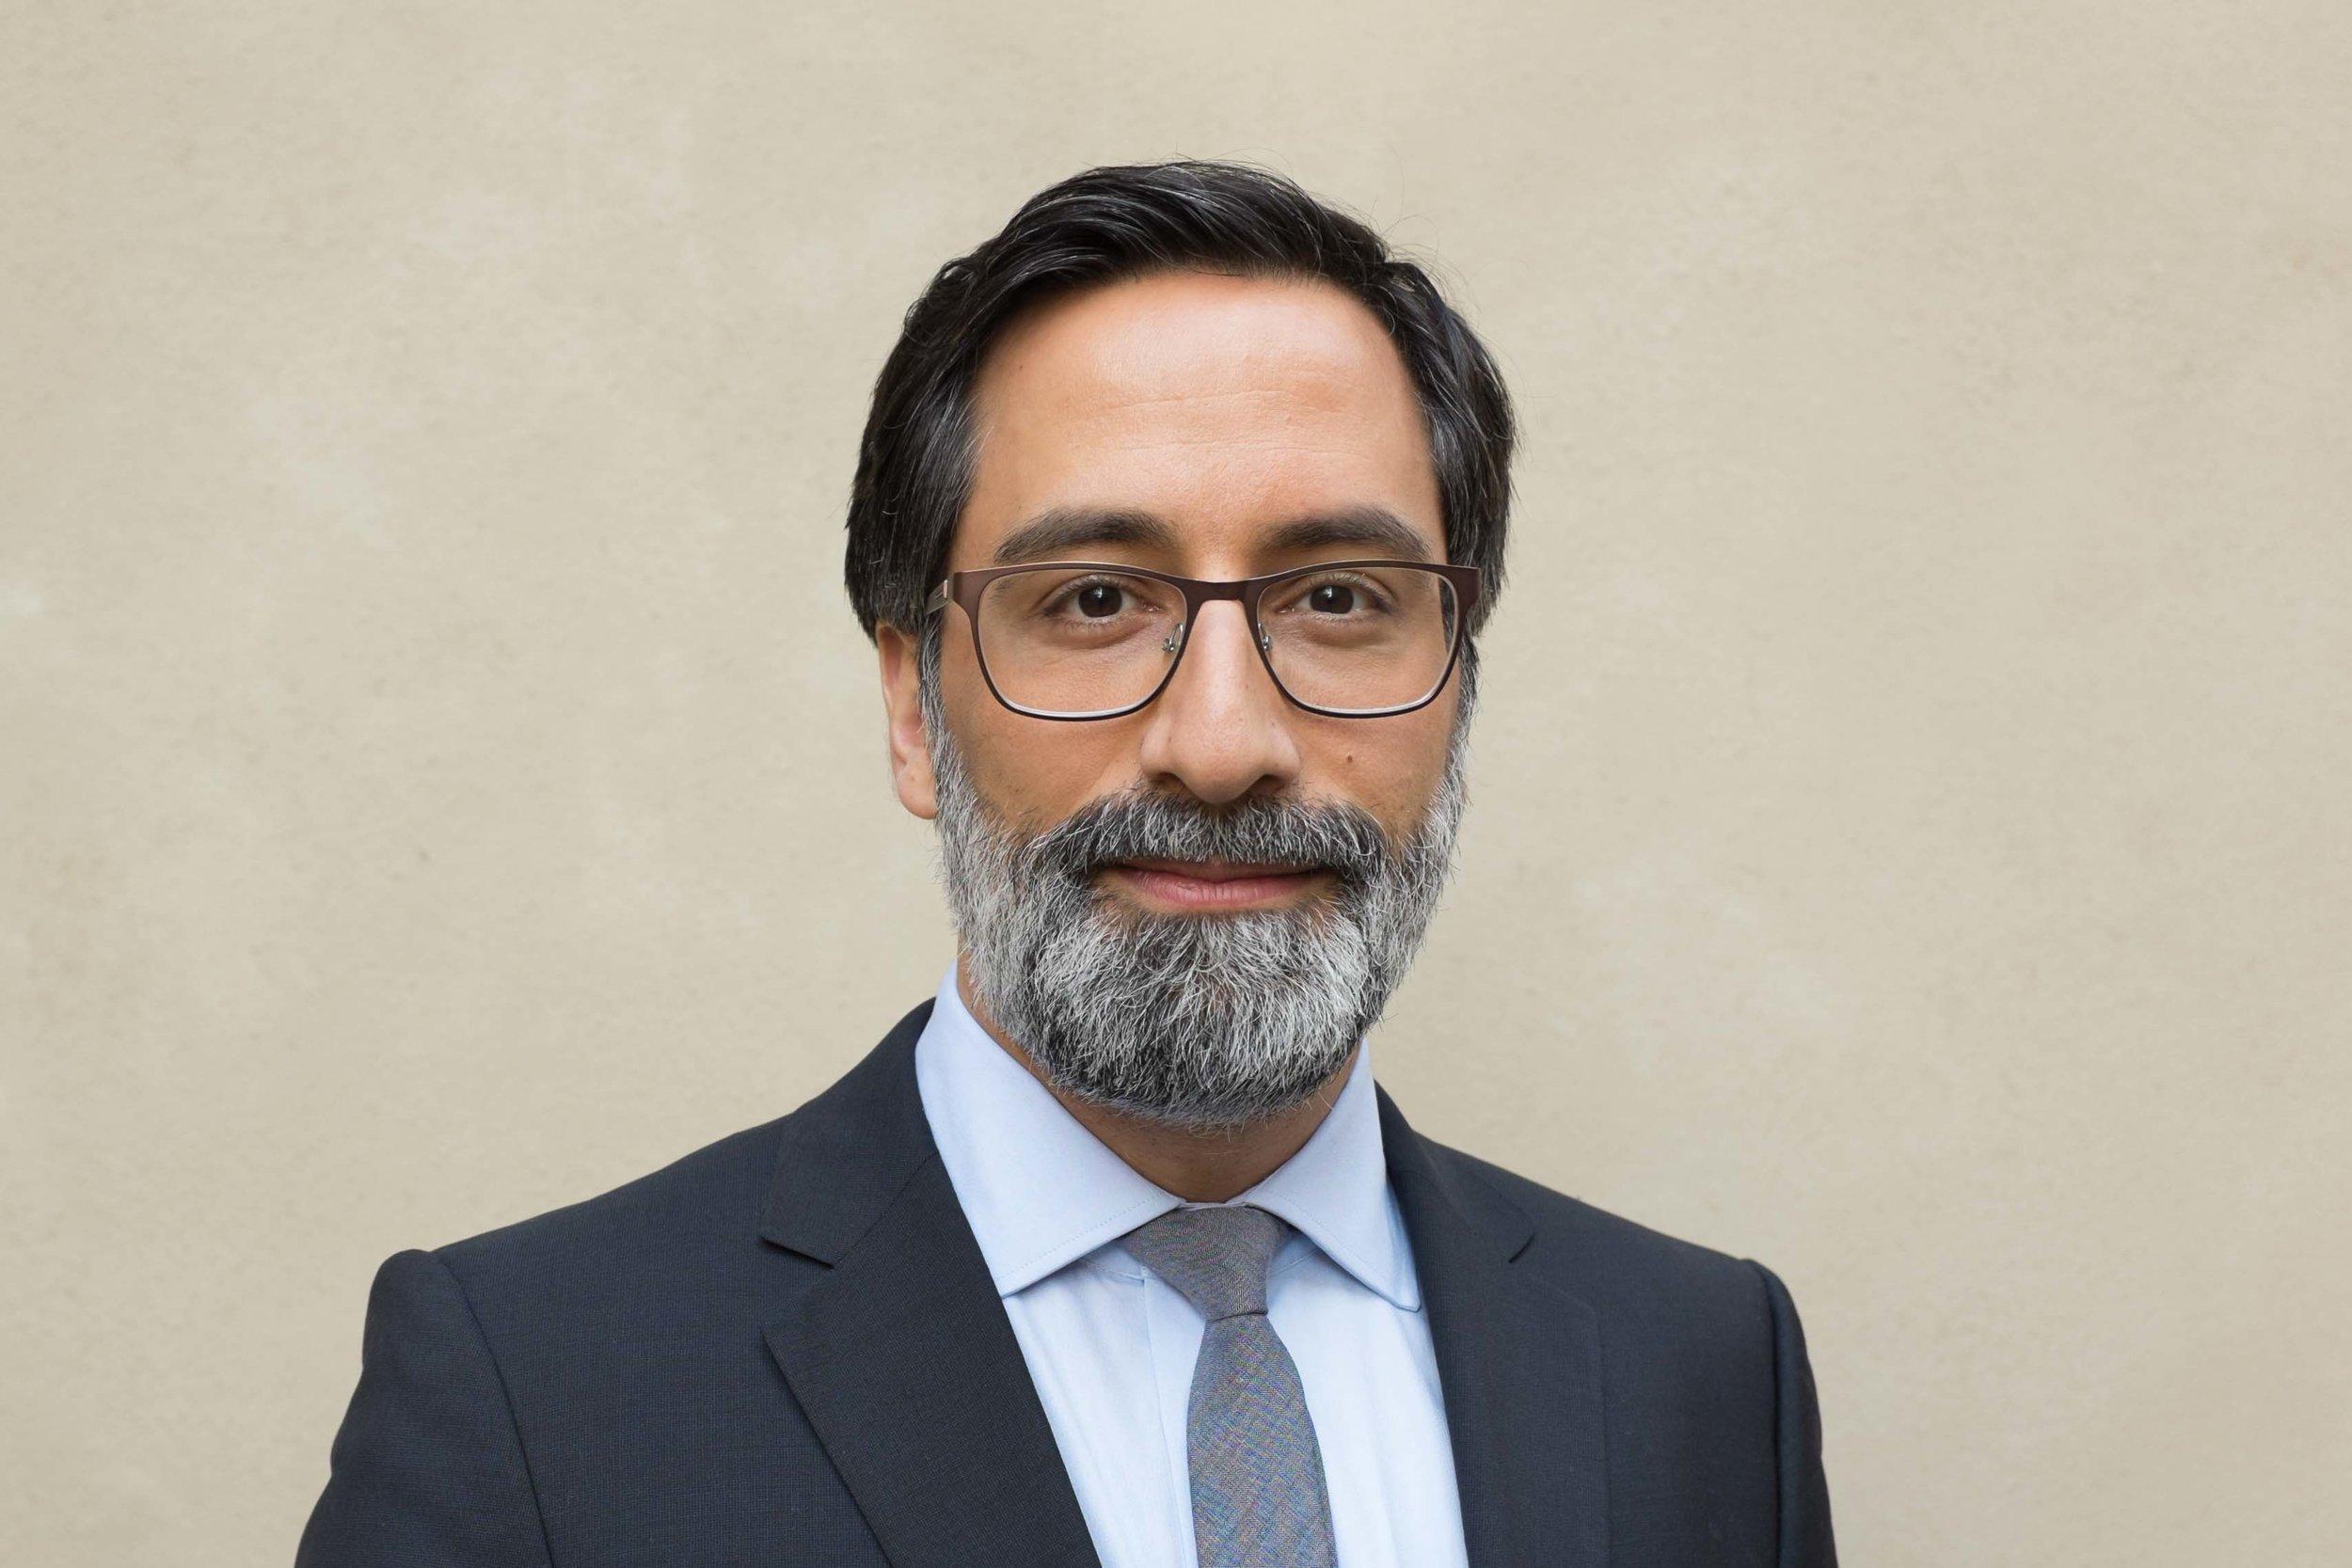 Alexander Goerlach - Founder & Publisher of The EuropeanAdviser to the F. D. Roosevelt Foundation at Harvard University College